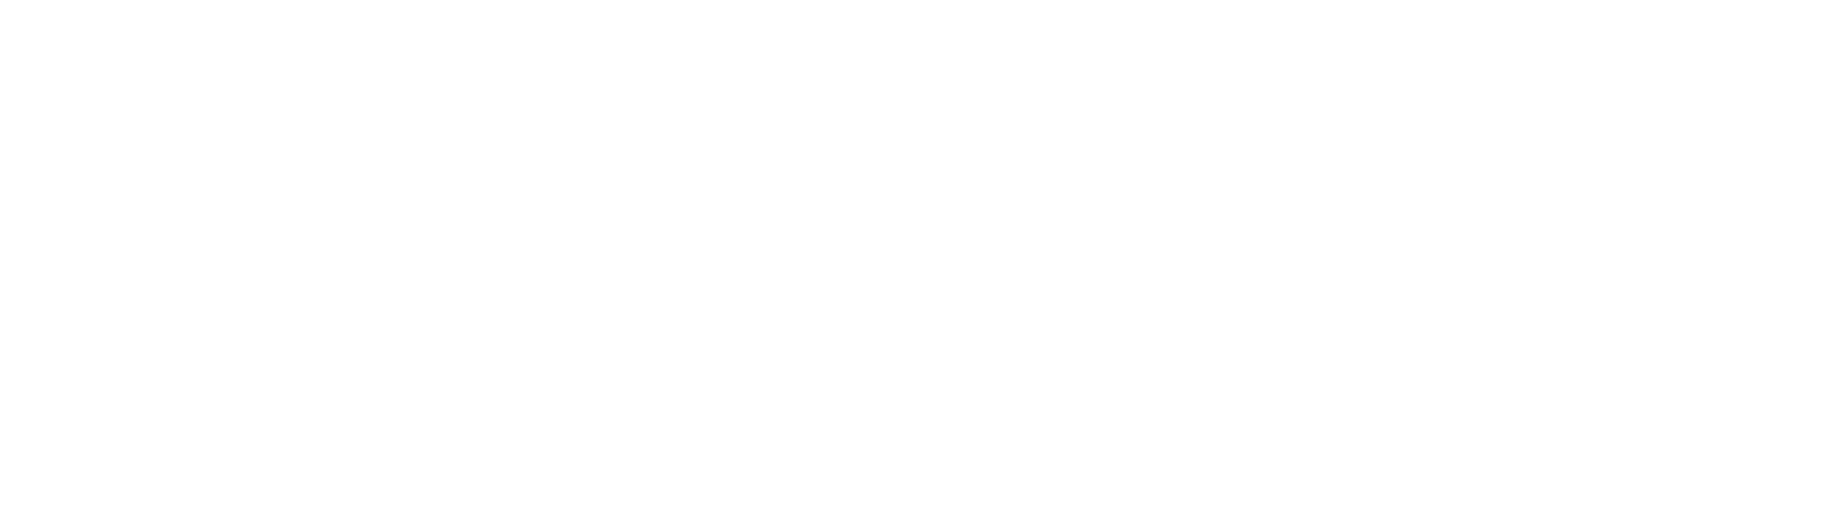 logo bíle